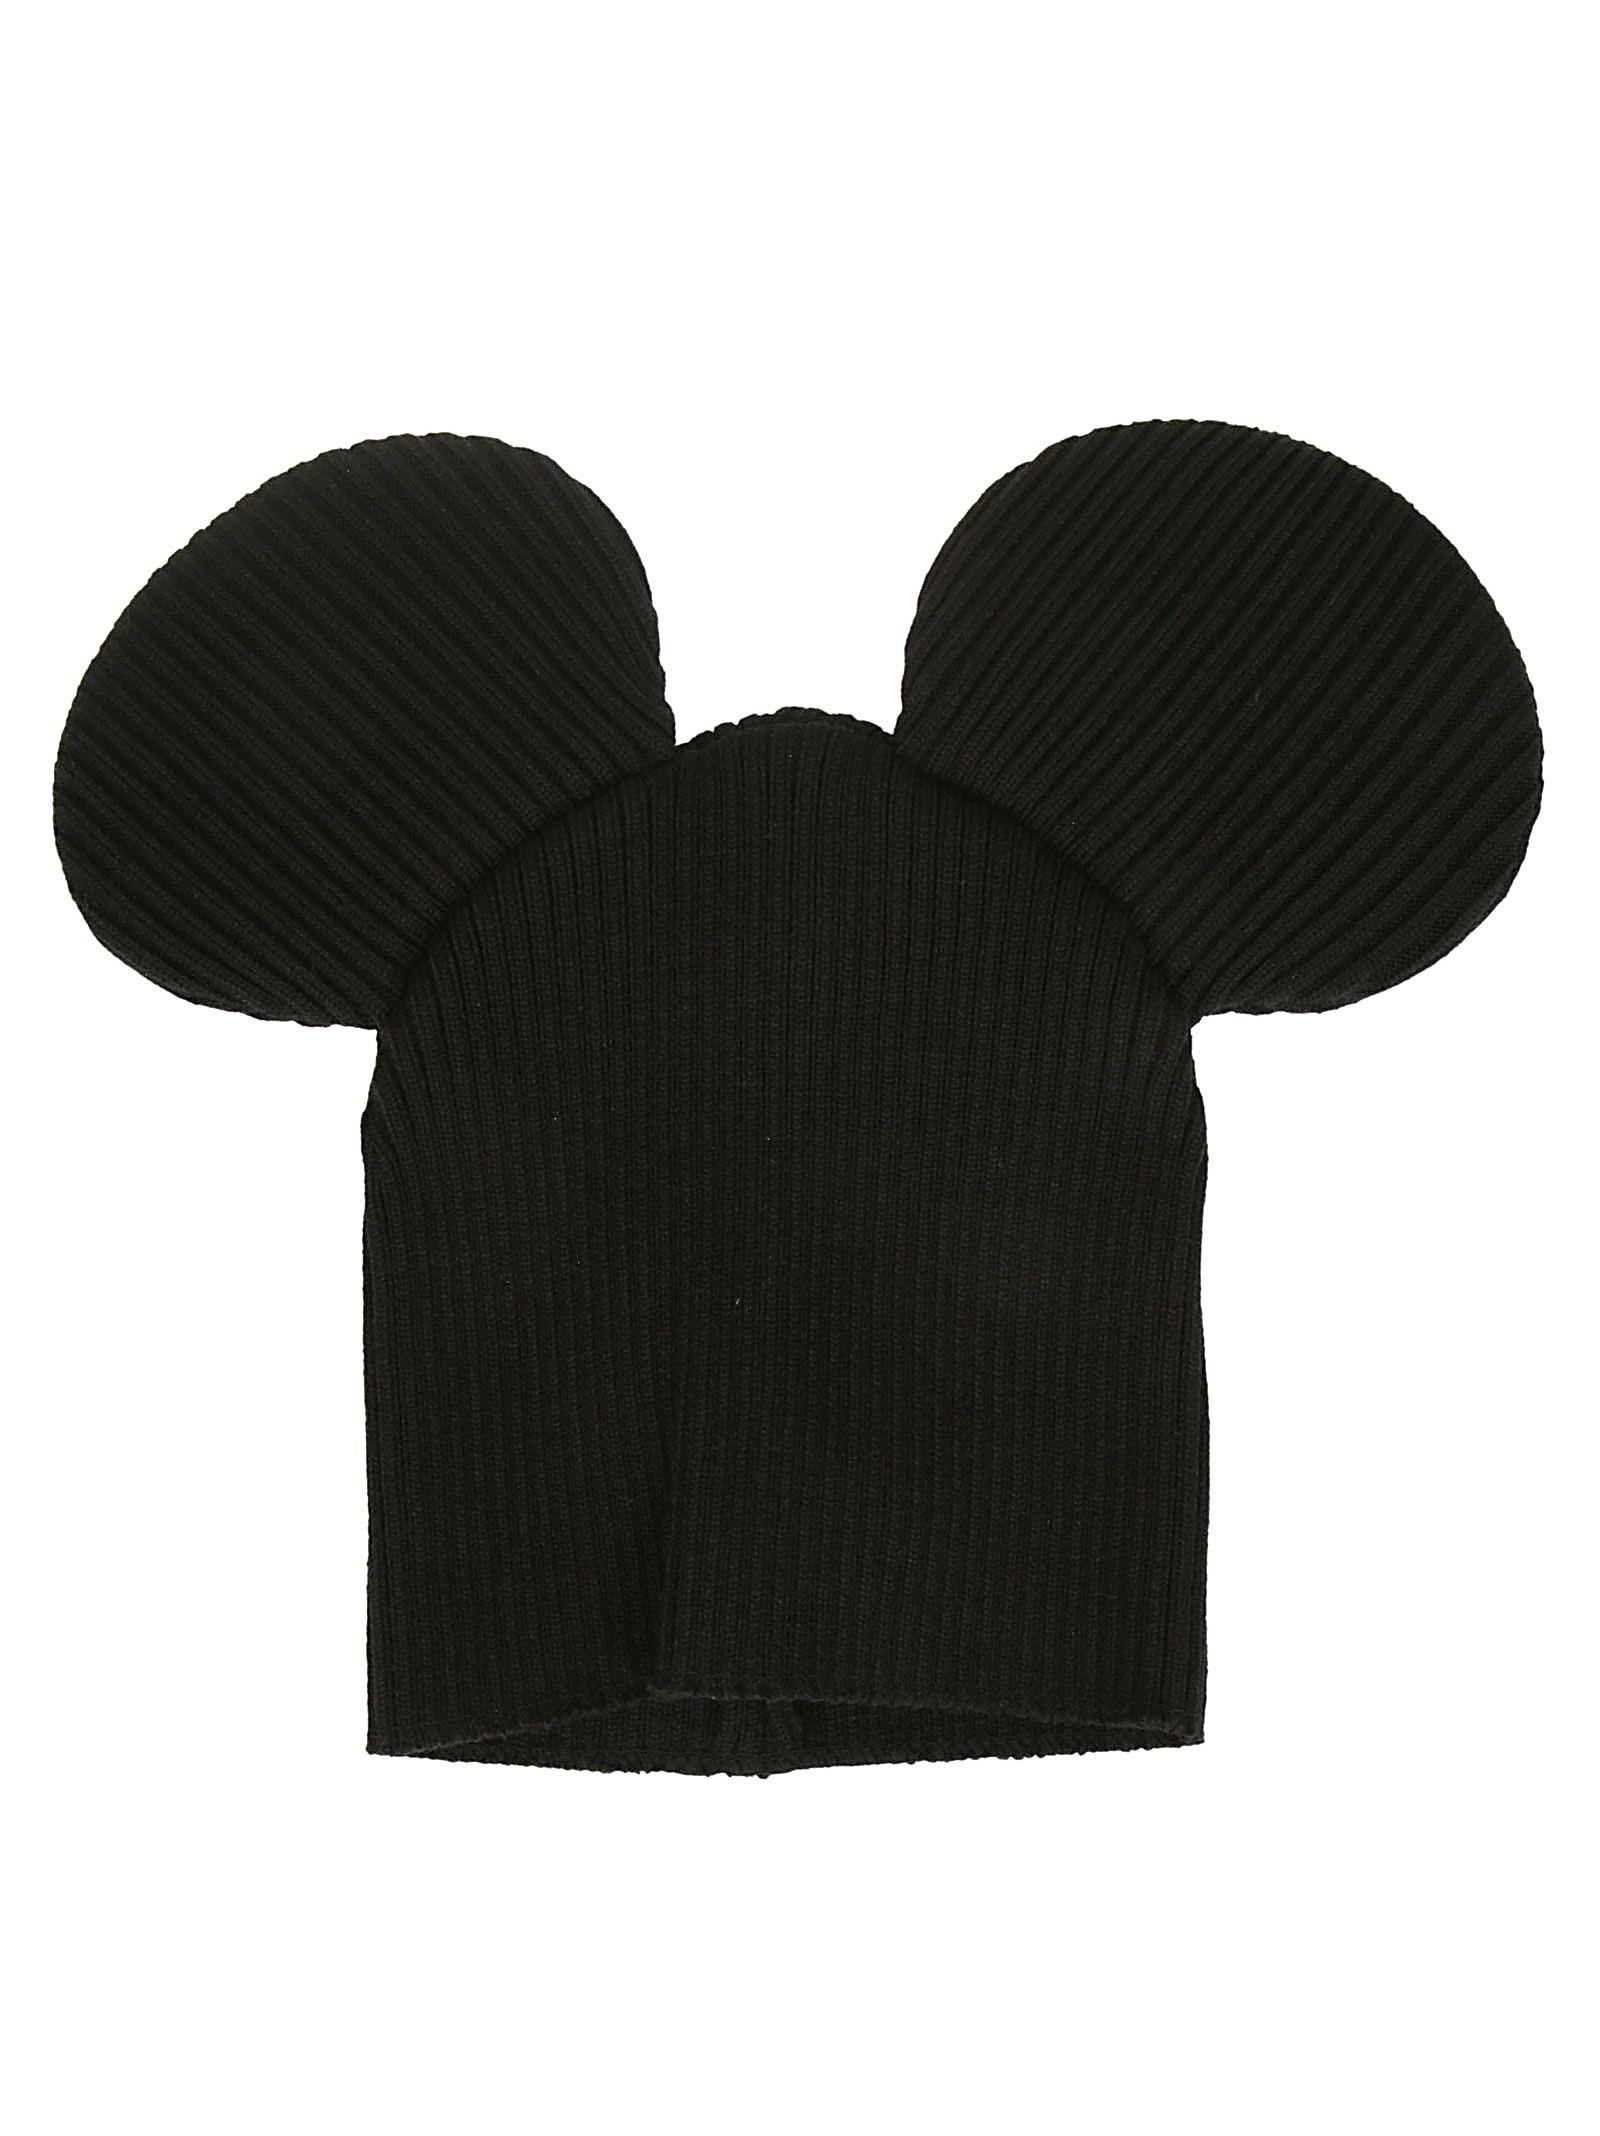 COMME DES GARÇONS BOYS Comme Des Garçons Boy Beany Mickey Mouse in Black